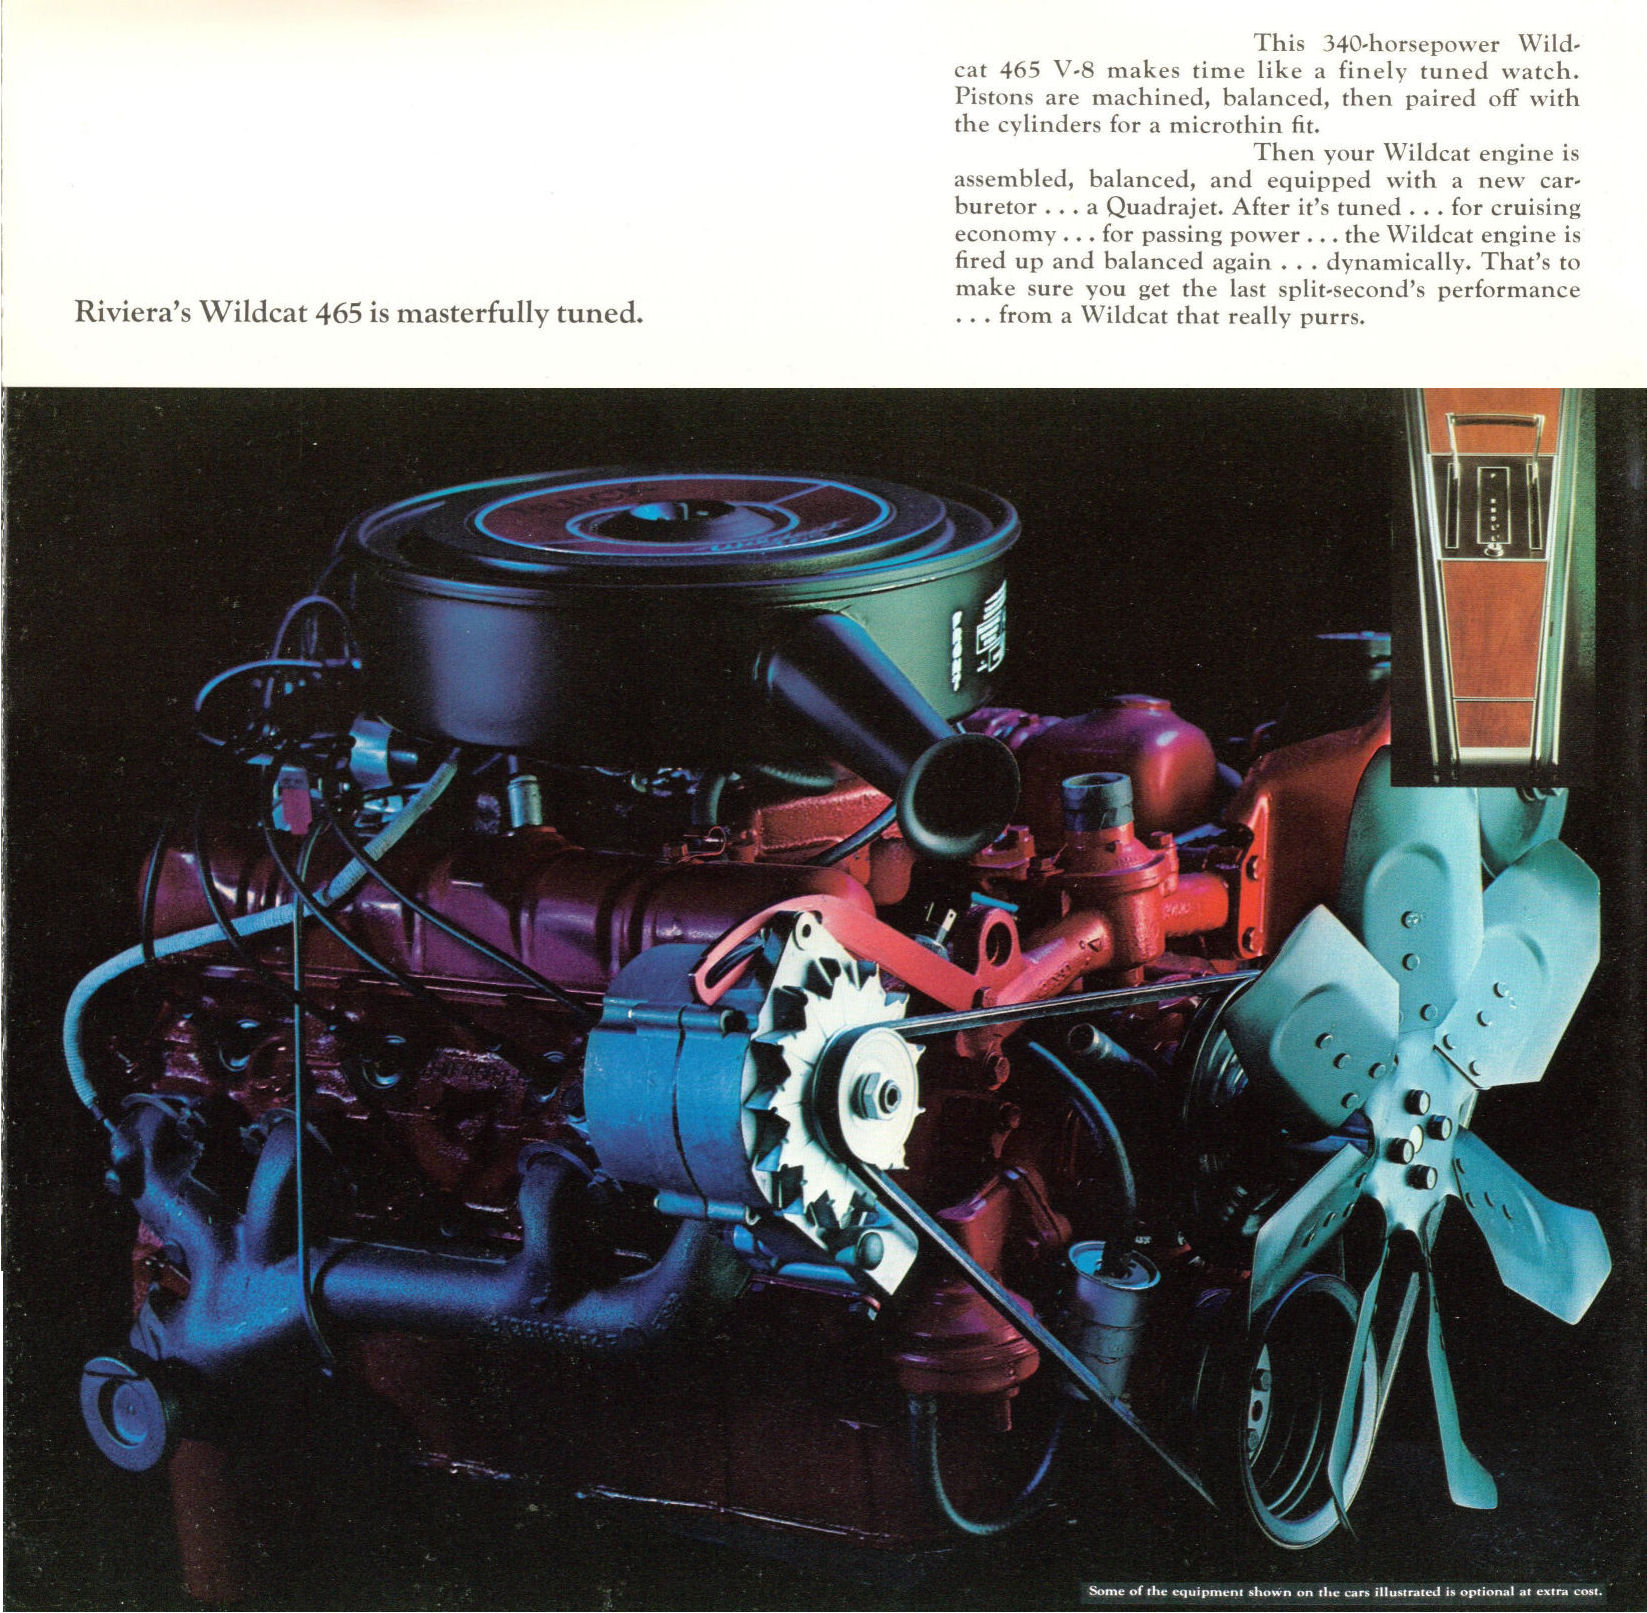 Buick Wildcat V8 Engine: Directory Index: Buick/1966_Buick/1966_Buick_Riviera_Brochure